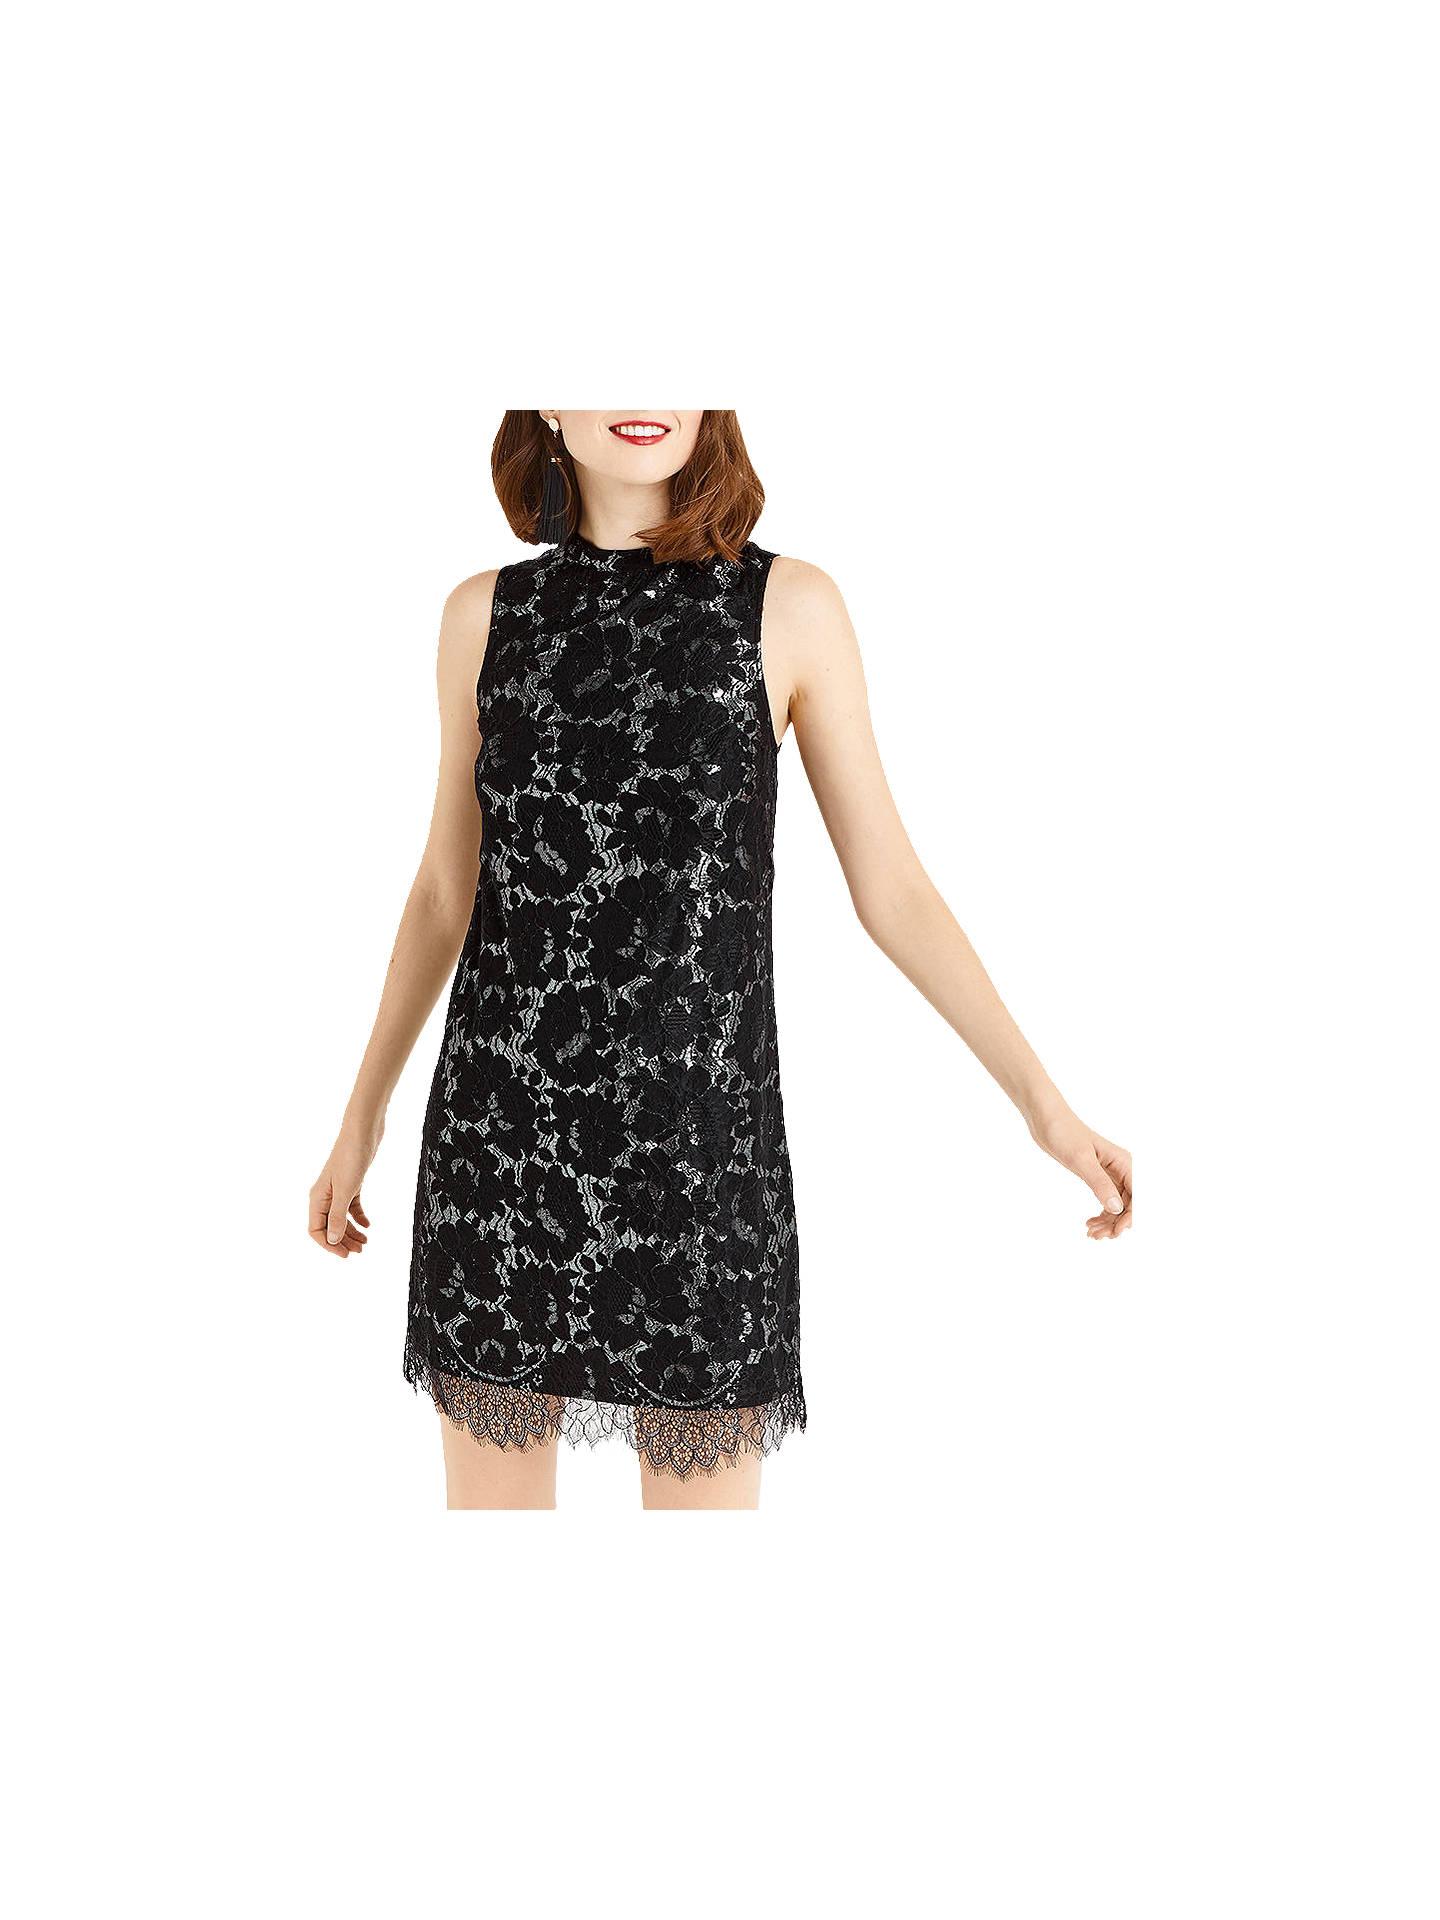 ded7c6afae0e Buy Oasis Metallic Lace Skater Dress, Black/Multi, 6 Online at johnlewis.